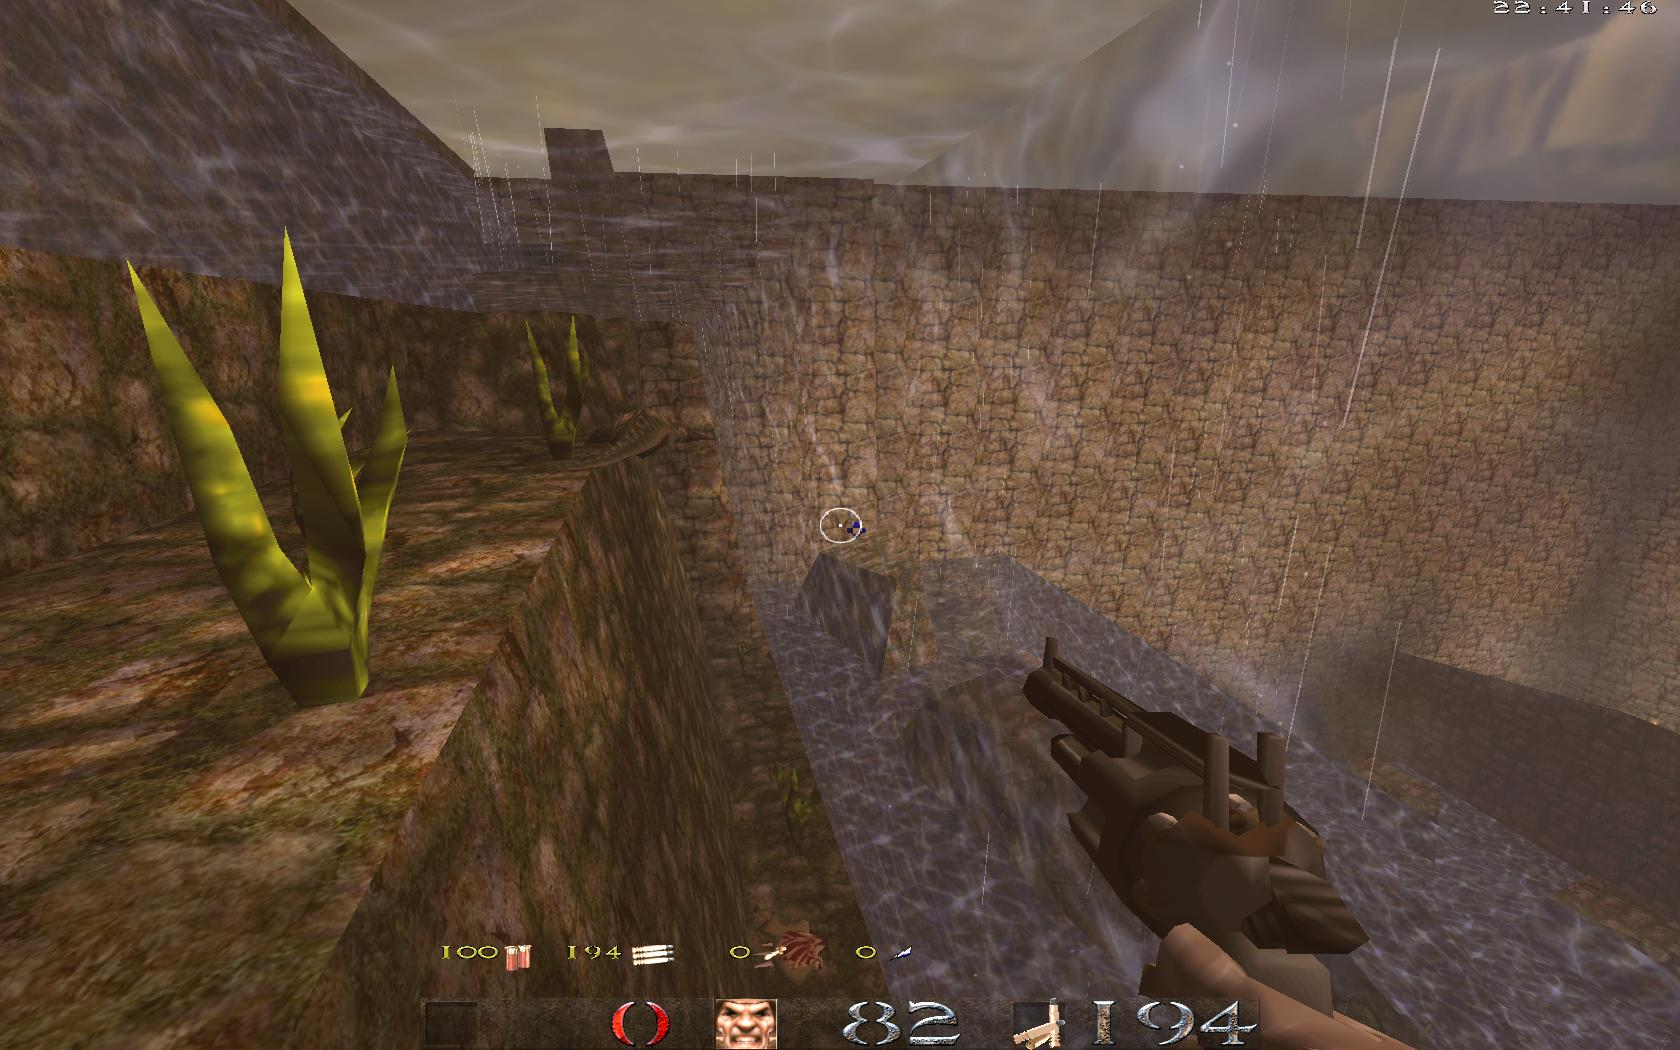 Quake Mountain addon for Quake 1 (qrack port) - вот это выглядит тупо и неестественно - Quake Мод